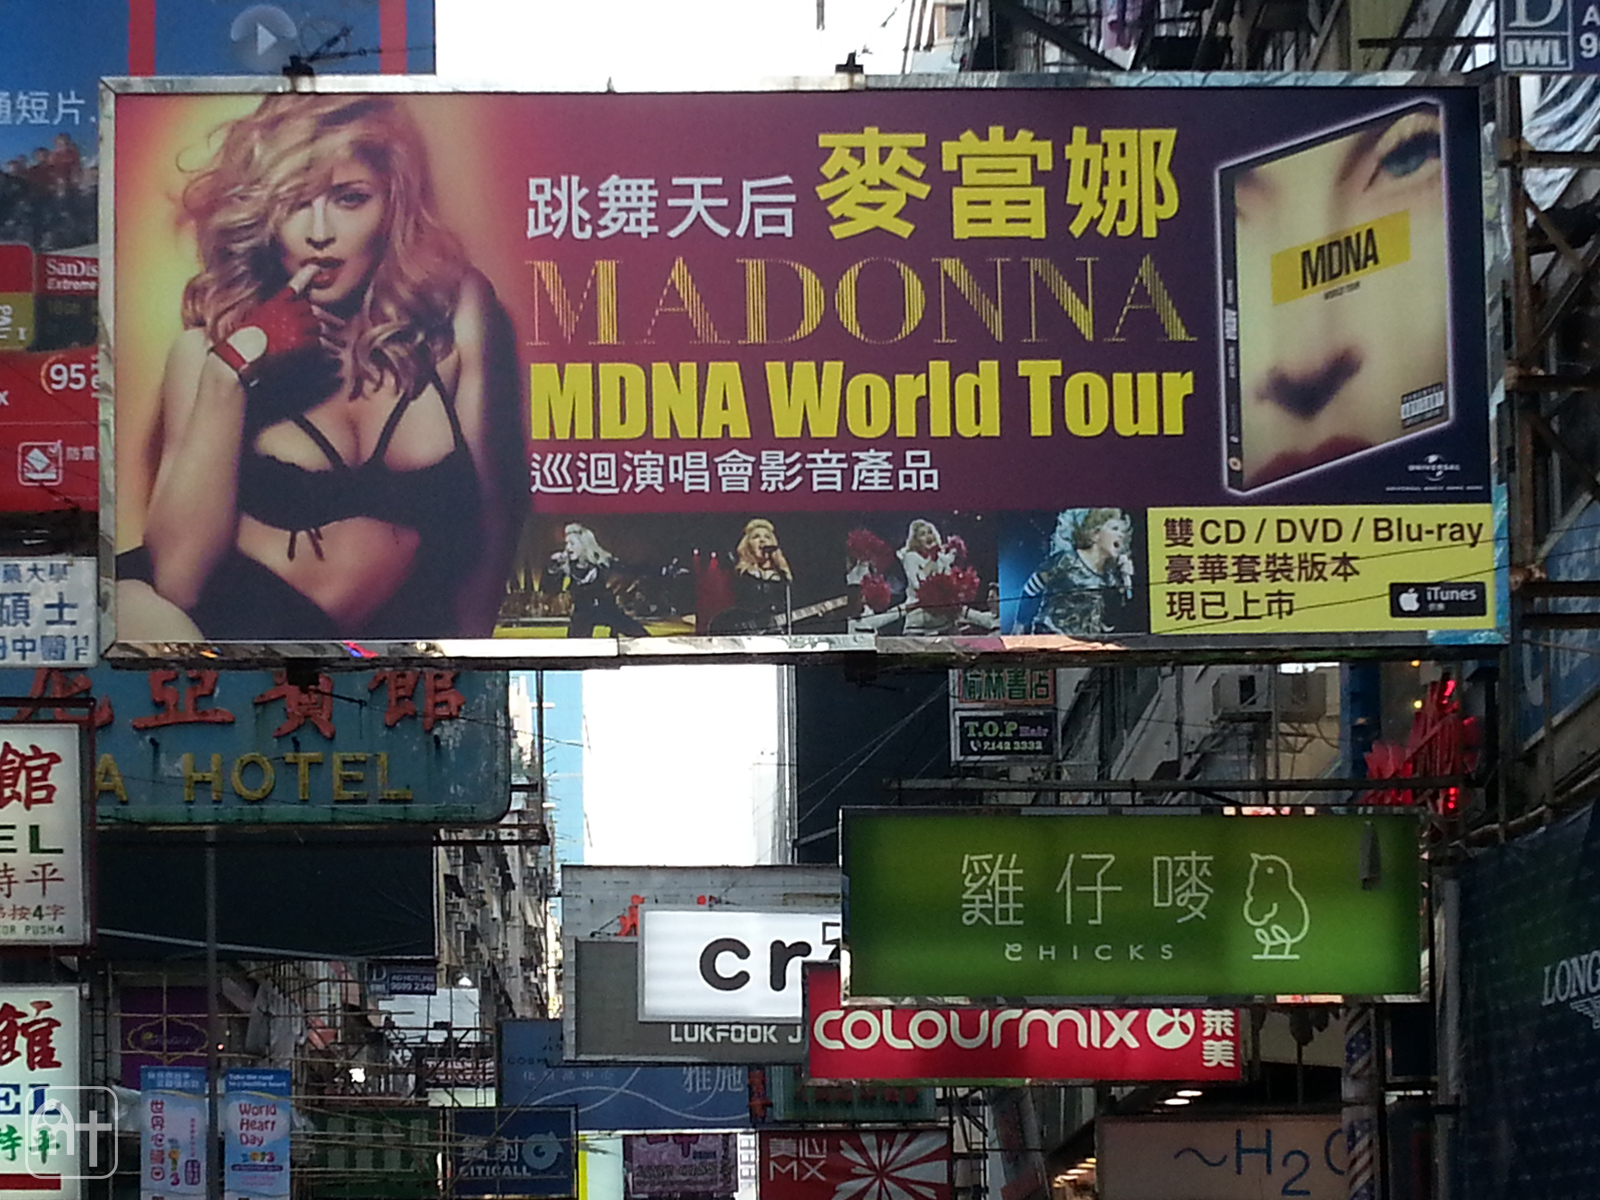 MADONNA MDNA TOUR PROMO HONG KONG 3